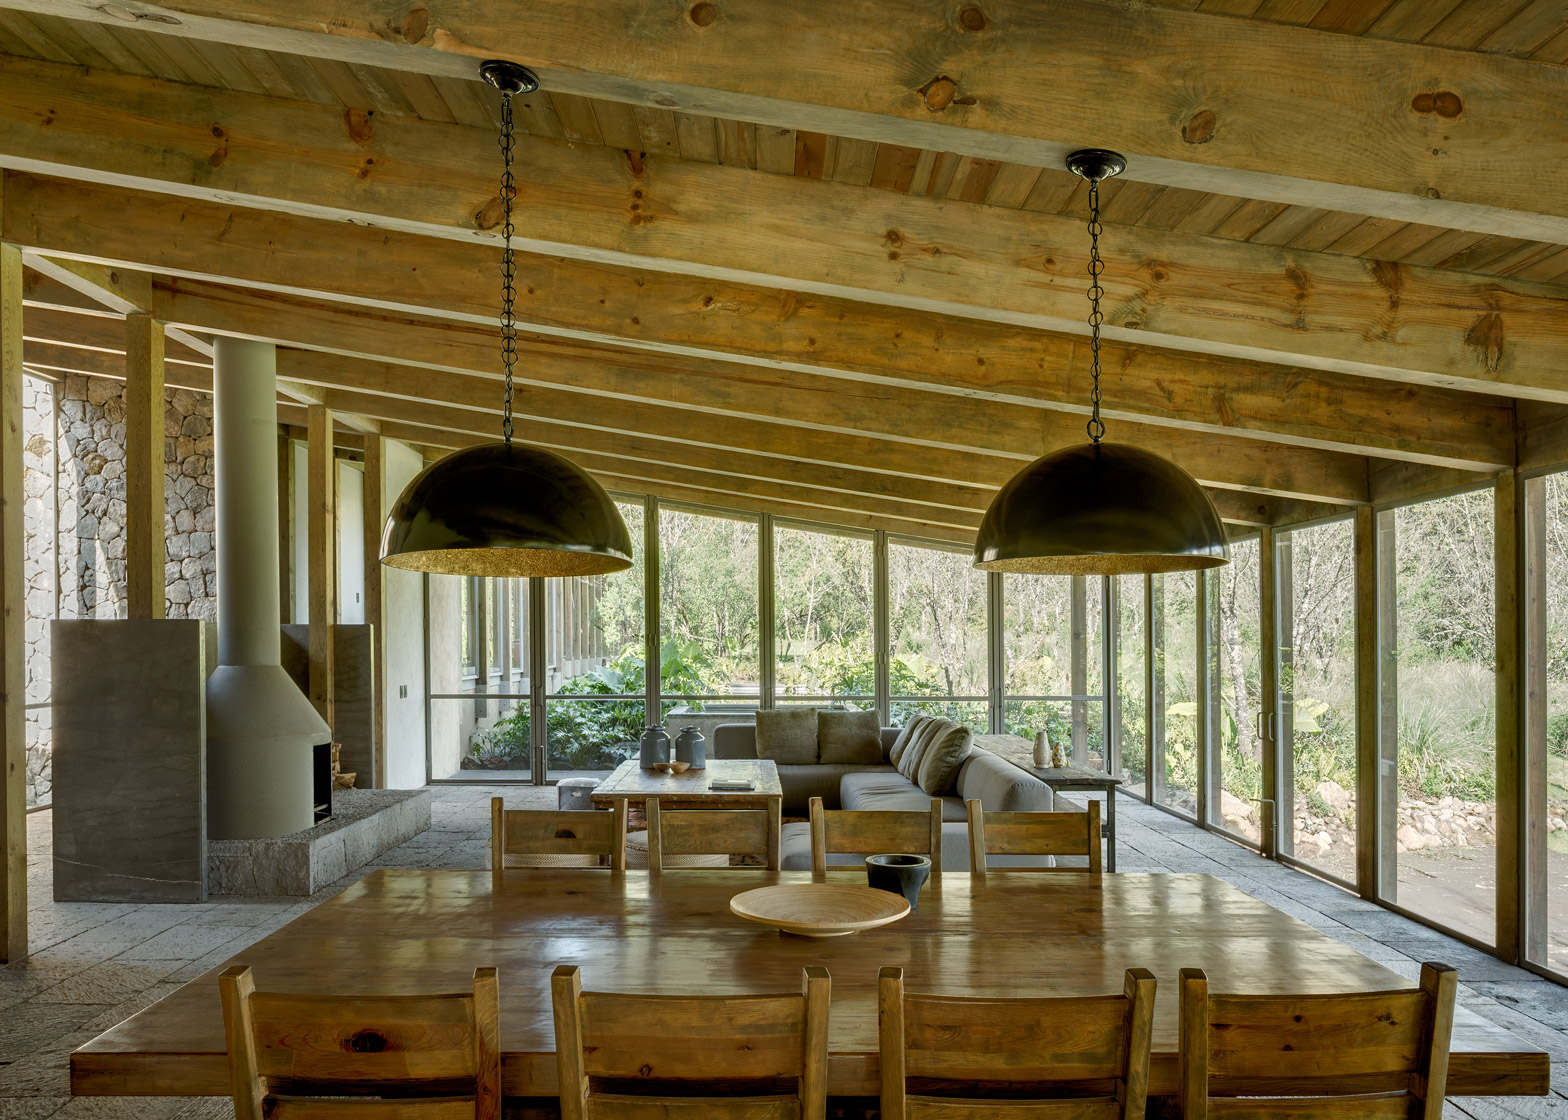 santana-house-cc-arquitectos-valle-de-bravo-mexico-city_dezeen_1568_2.jpg